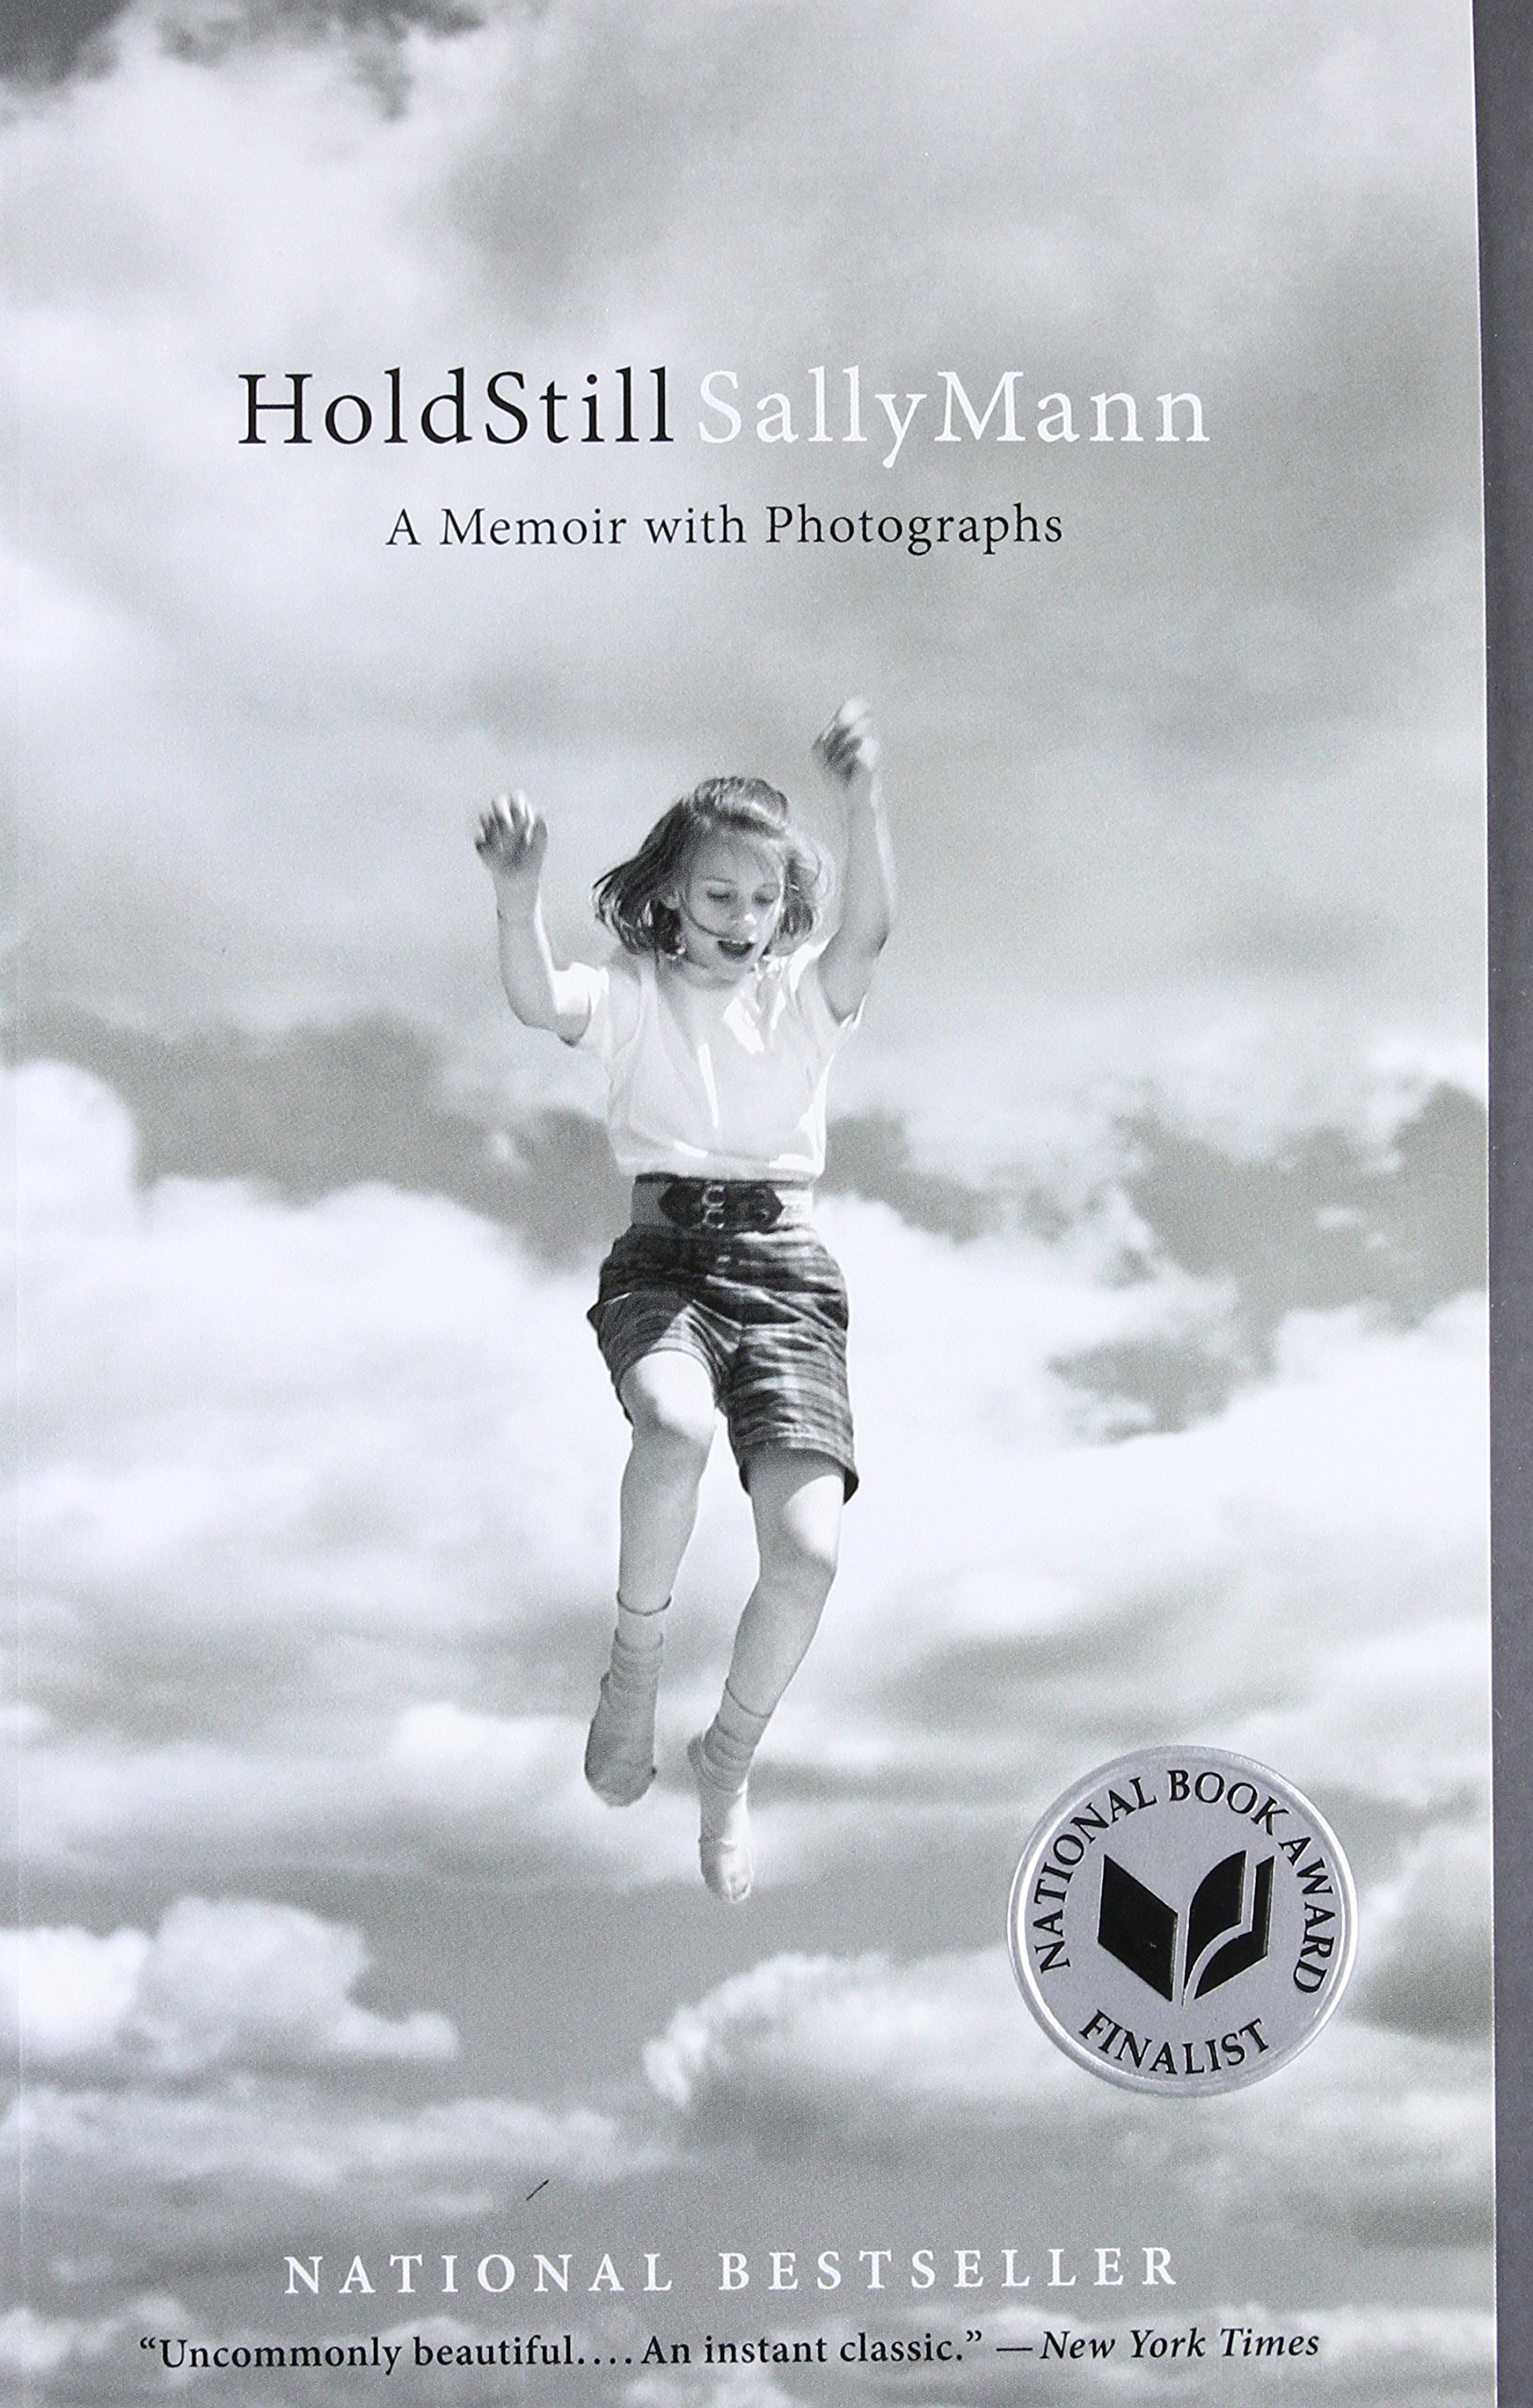 Hold Still: A Memoir with Photographs by sally mann - A beautiful memoir that any photographer will enjoy.